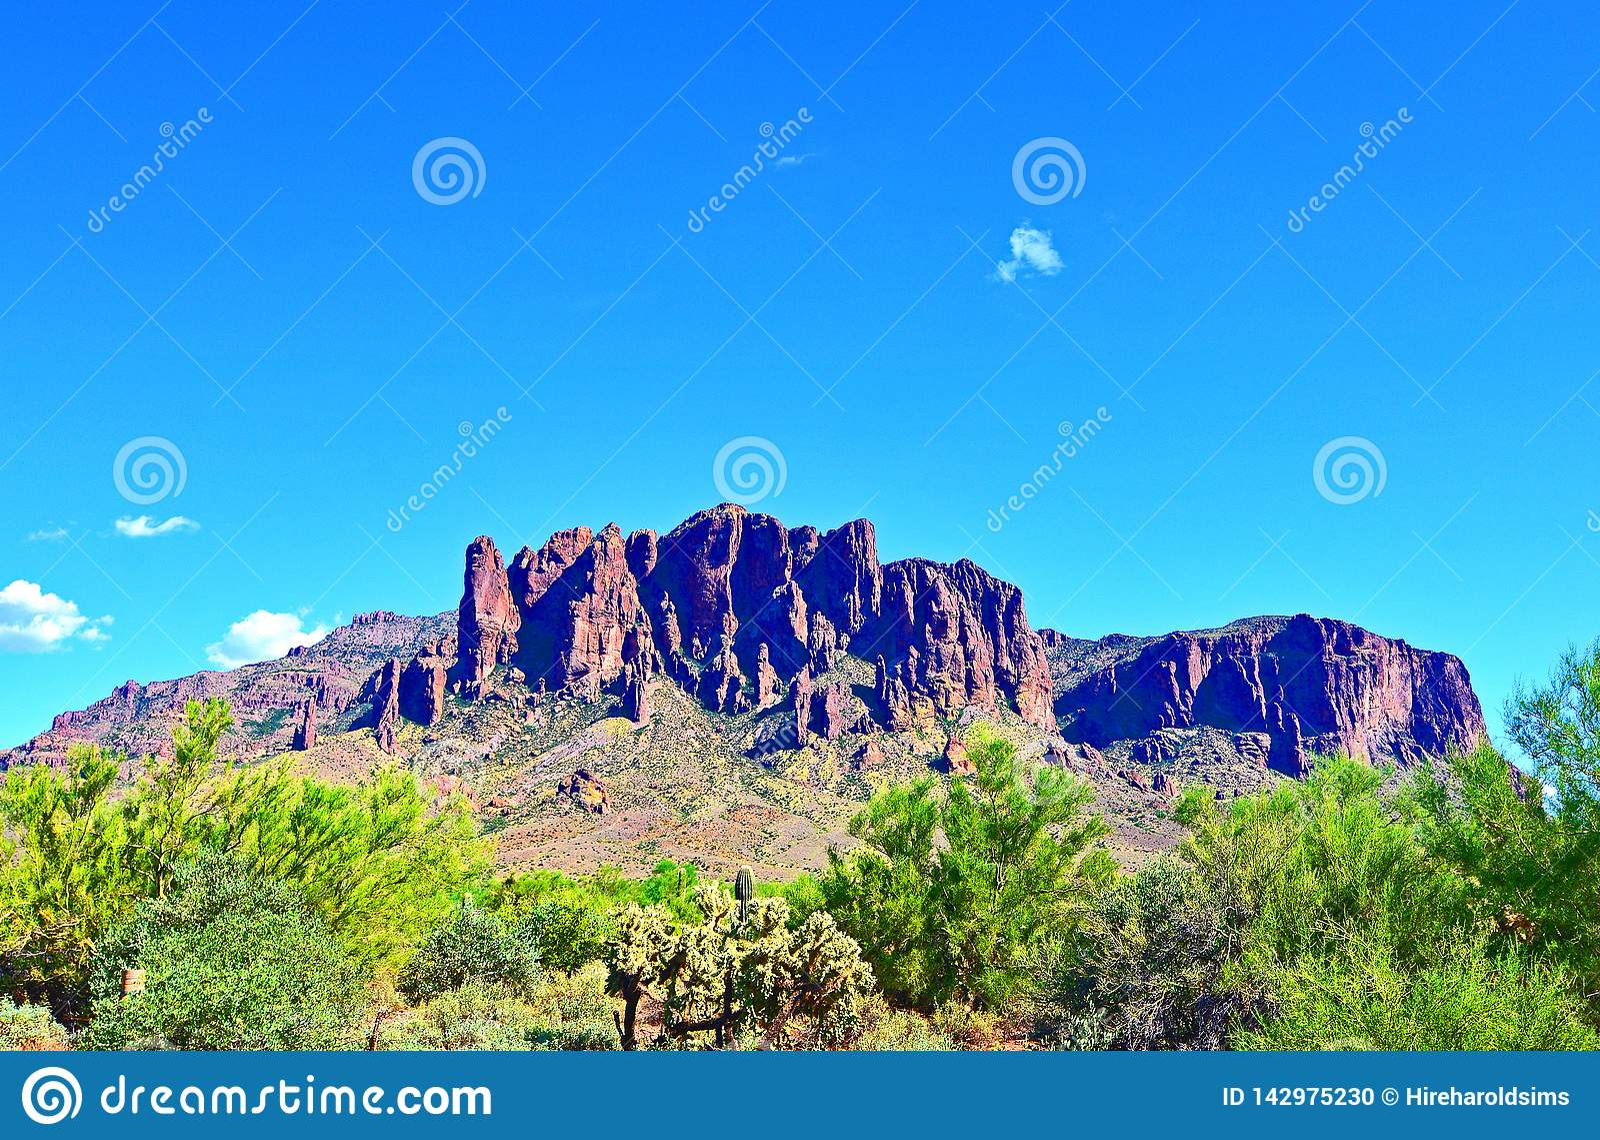 Saguaro Cactus Superstition Mountain Range Blue Skies Arizona